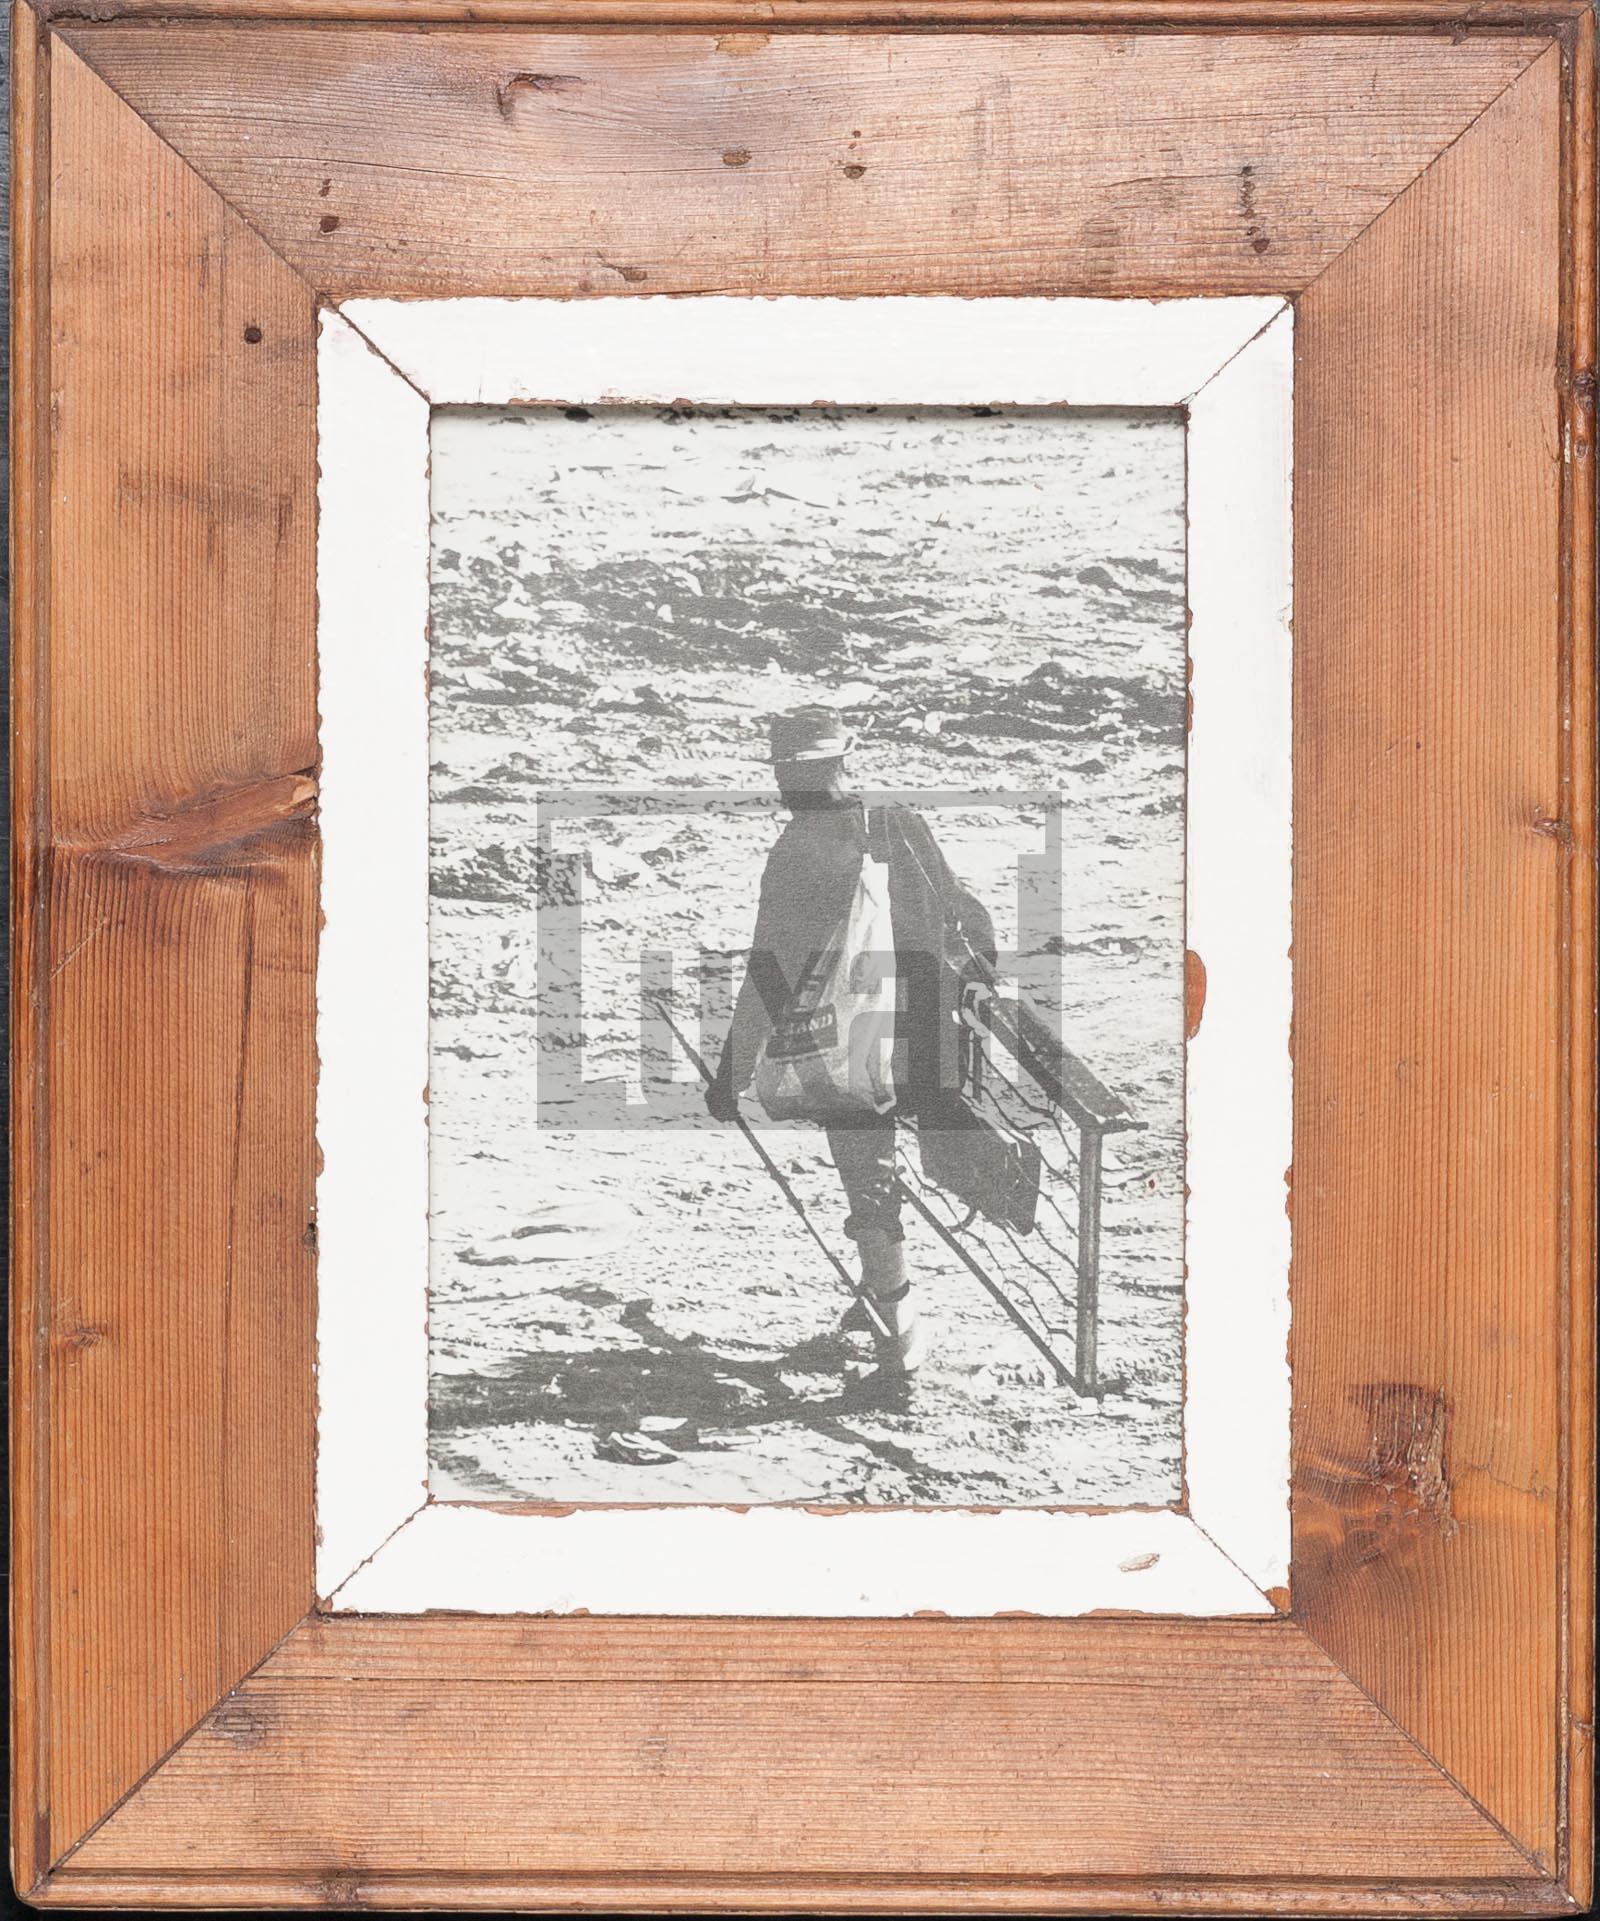 Vintage-Bilderrahmen aus altem Holz für Fotos DIN A5